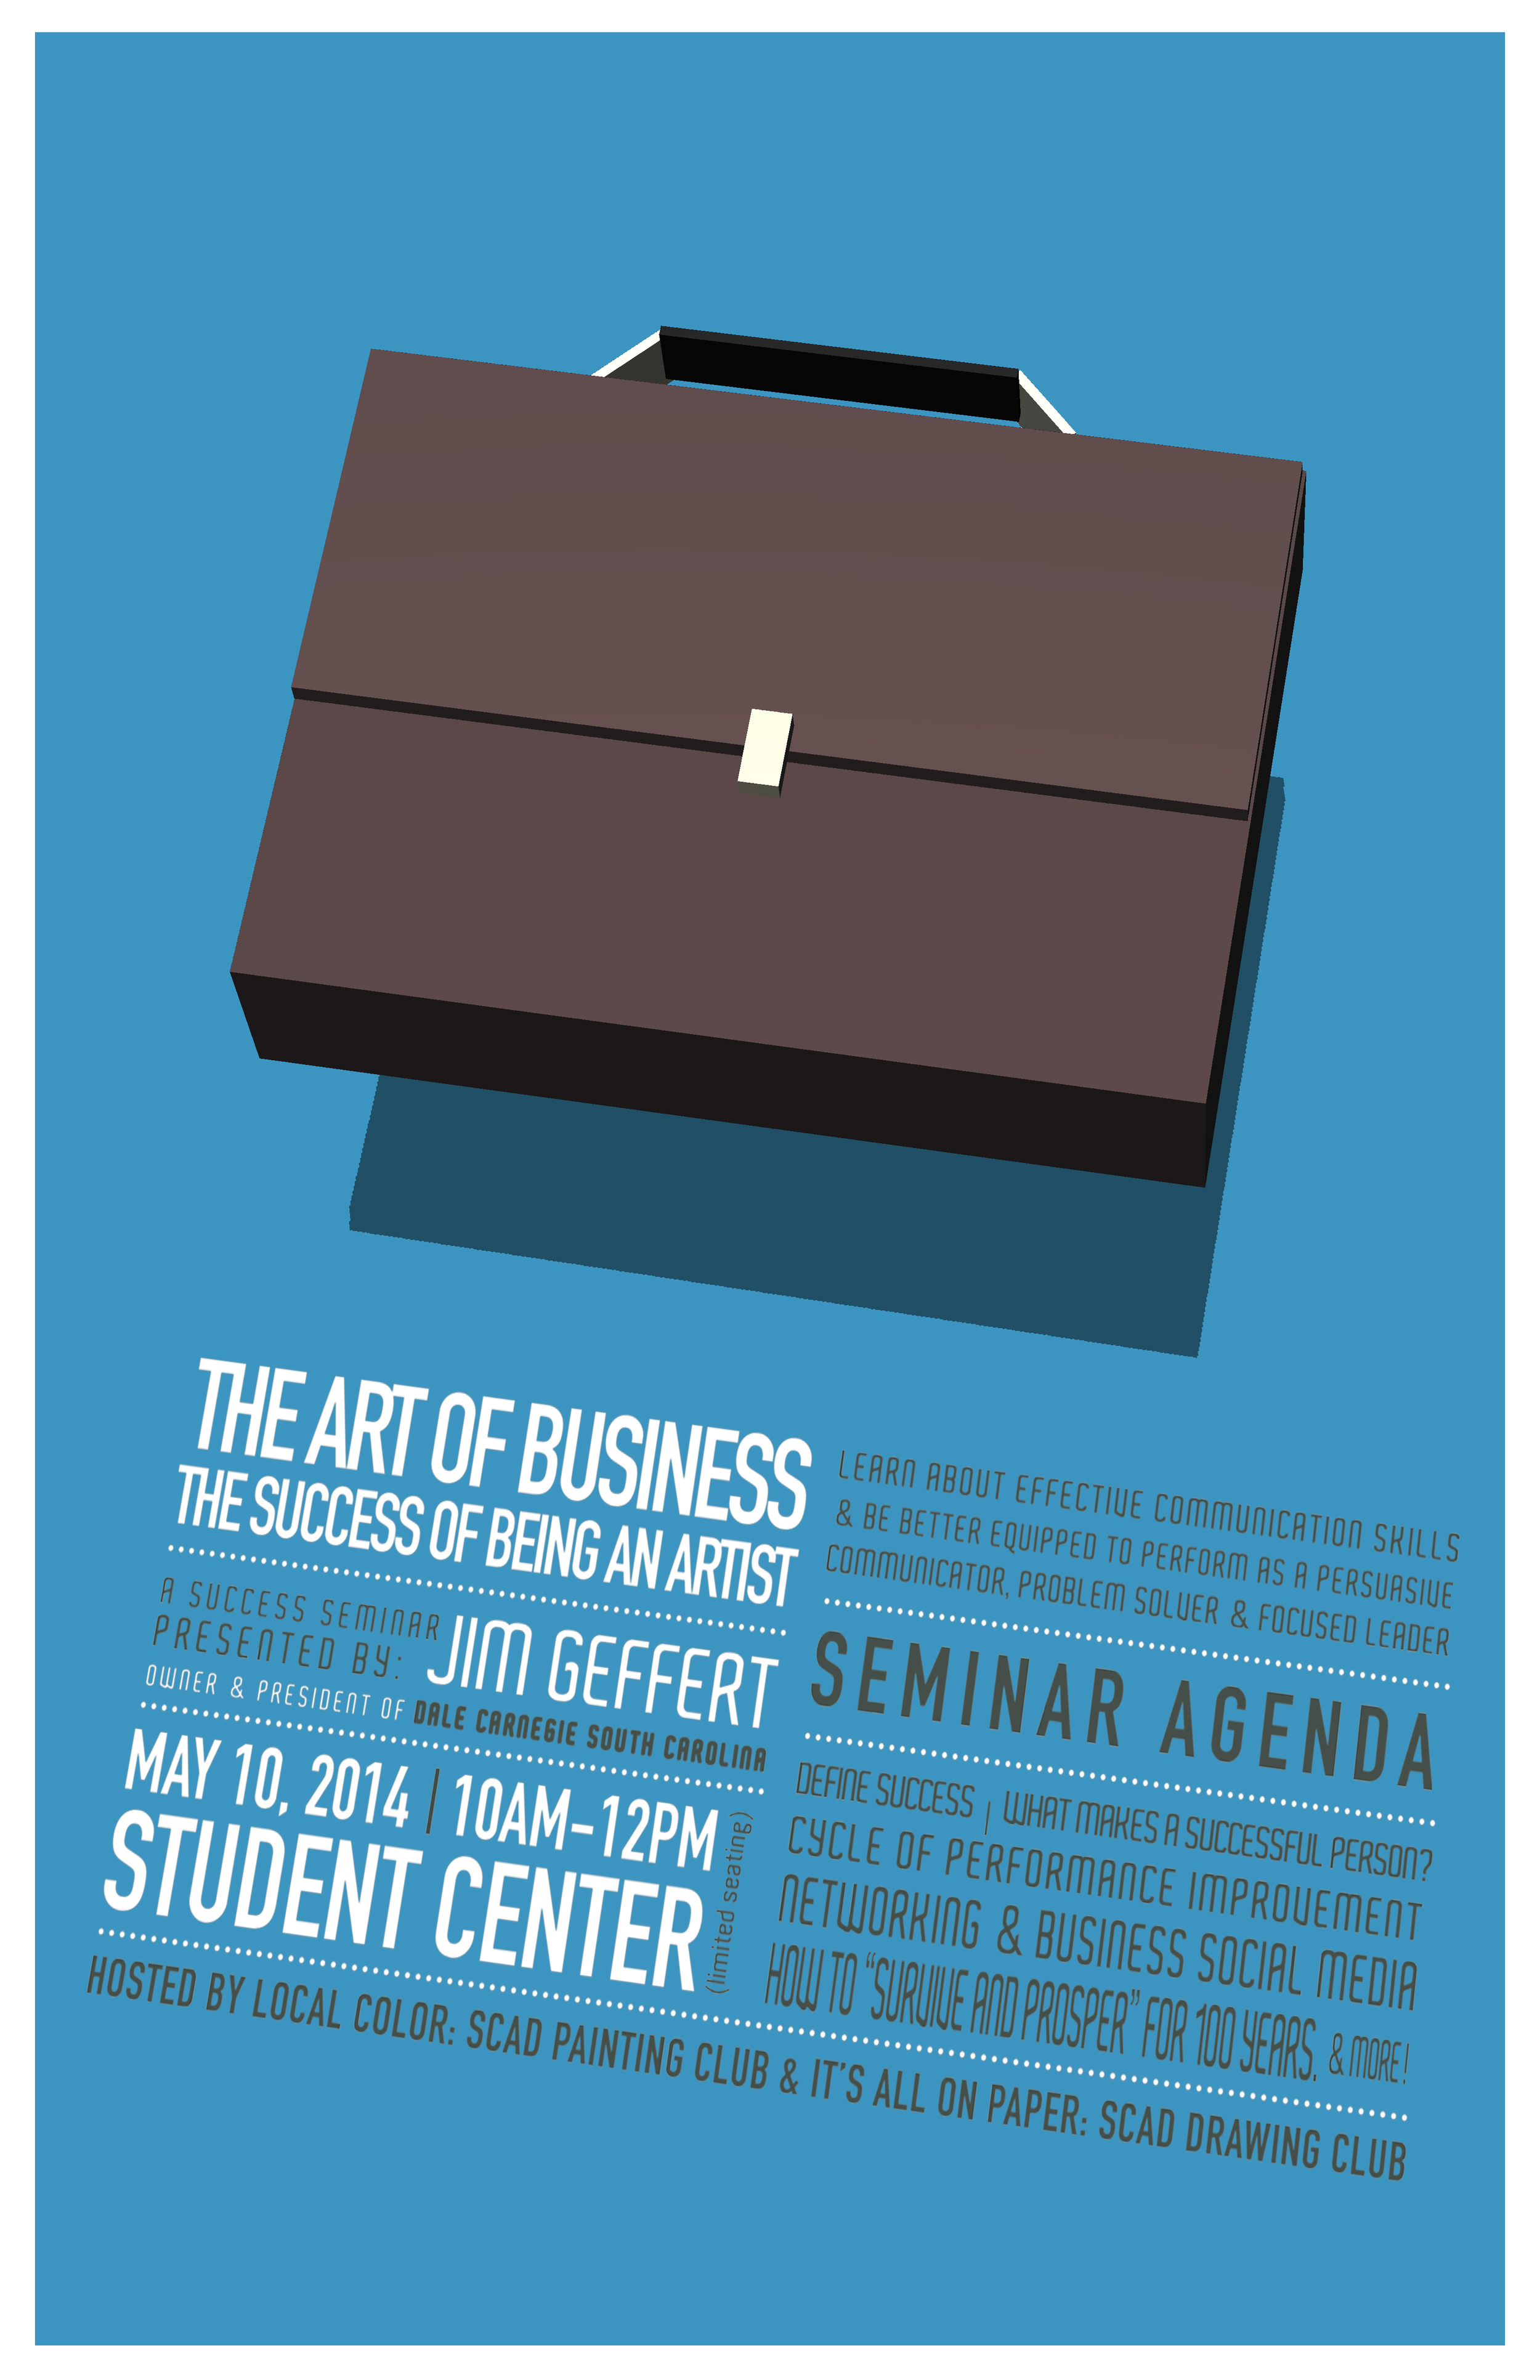 The Art of Business Poster.jpg